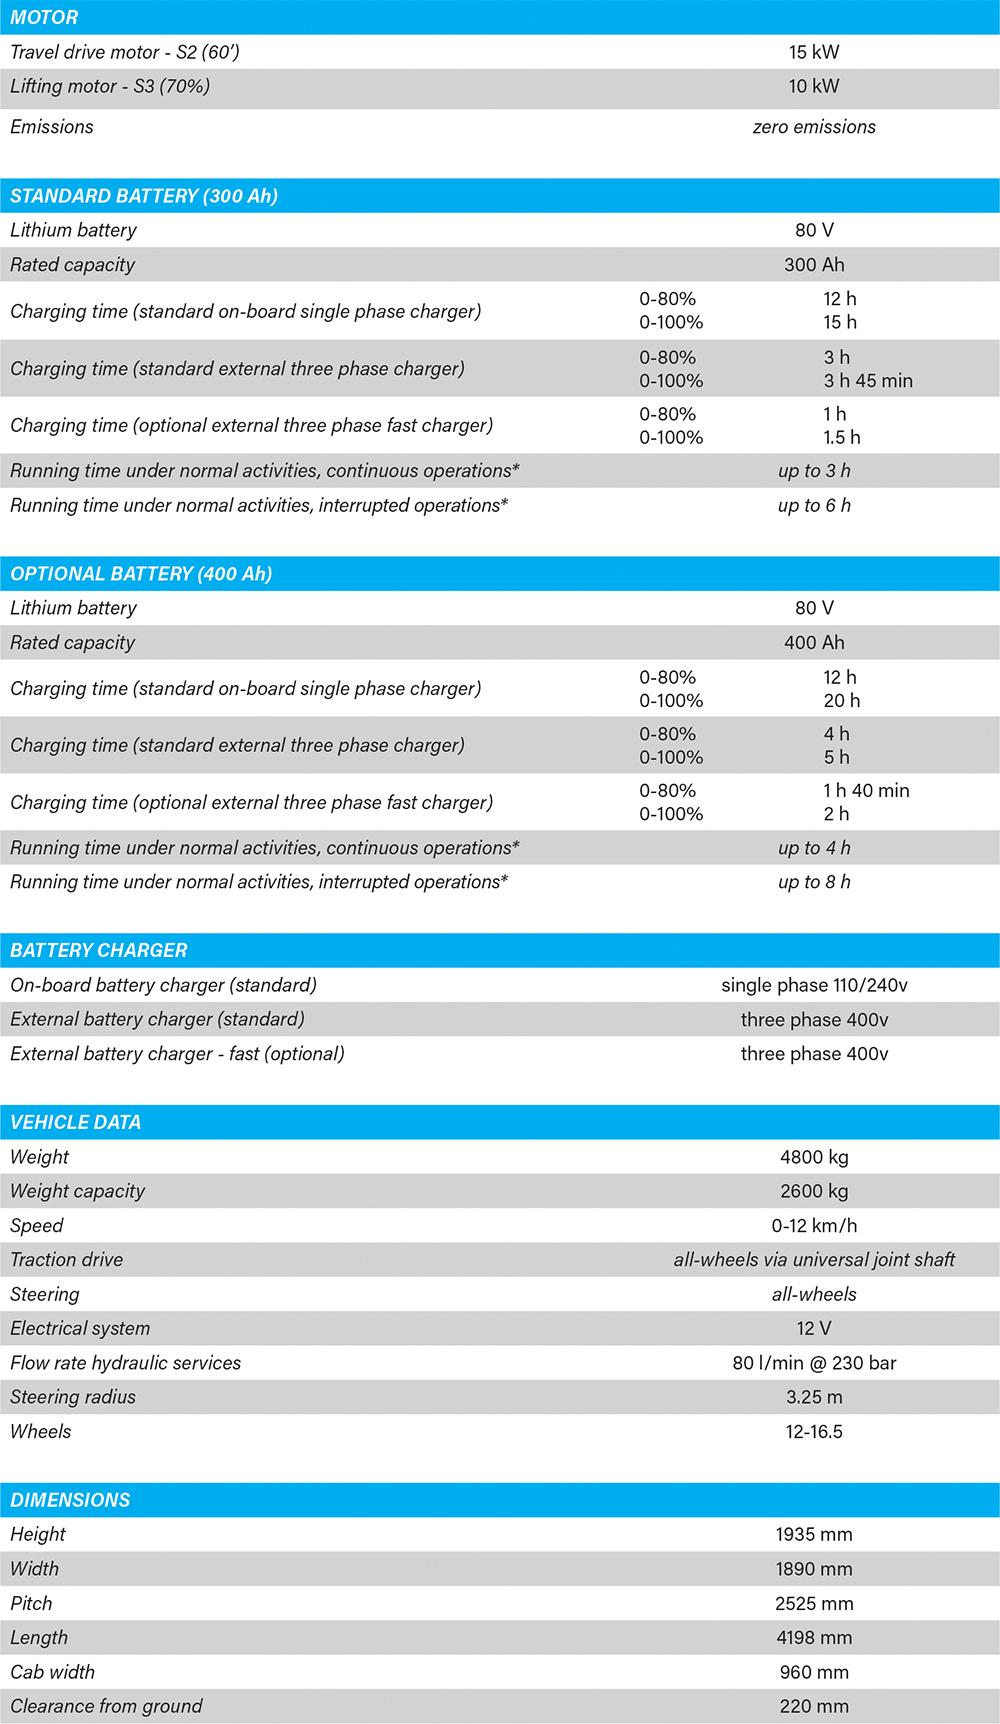 https://electrictelehandler.co.uk/wp-content/uploads/2021/05/Technical-Table-2.jpg